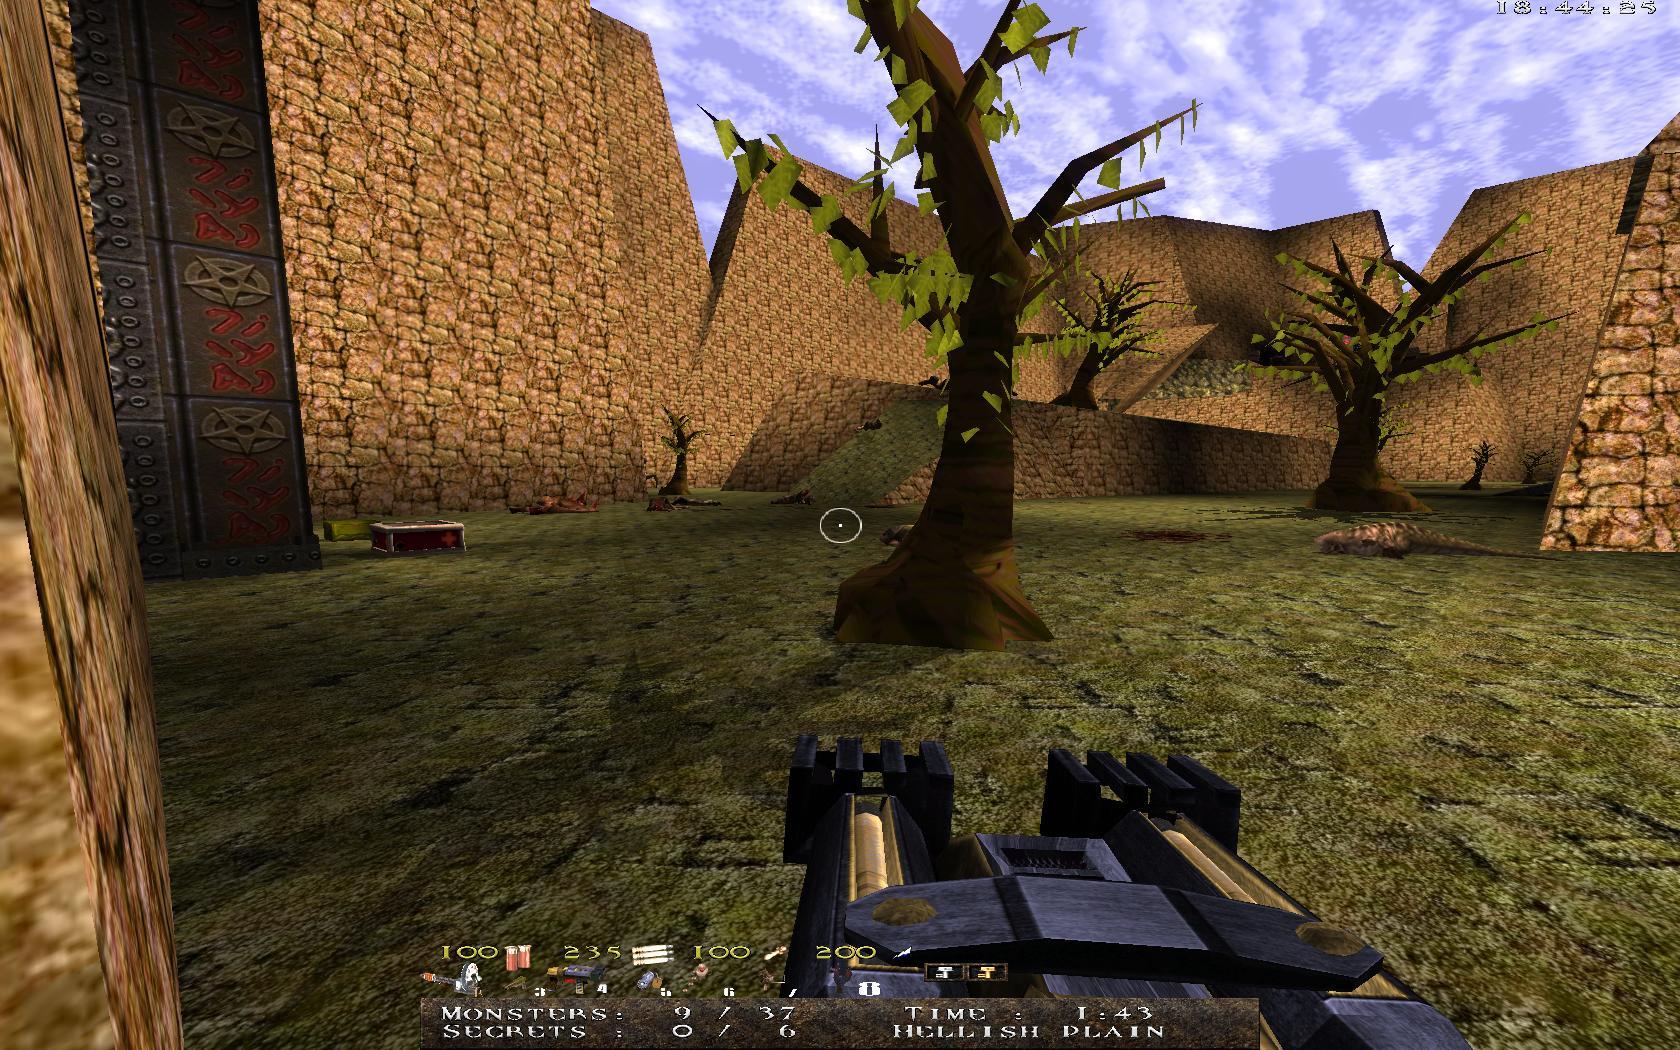 Quake Mountain addon for Quake 1 (qrack port) - уровень имеет слишком простую архитектуру - Quake Мод